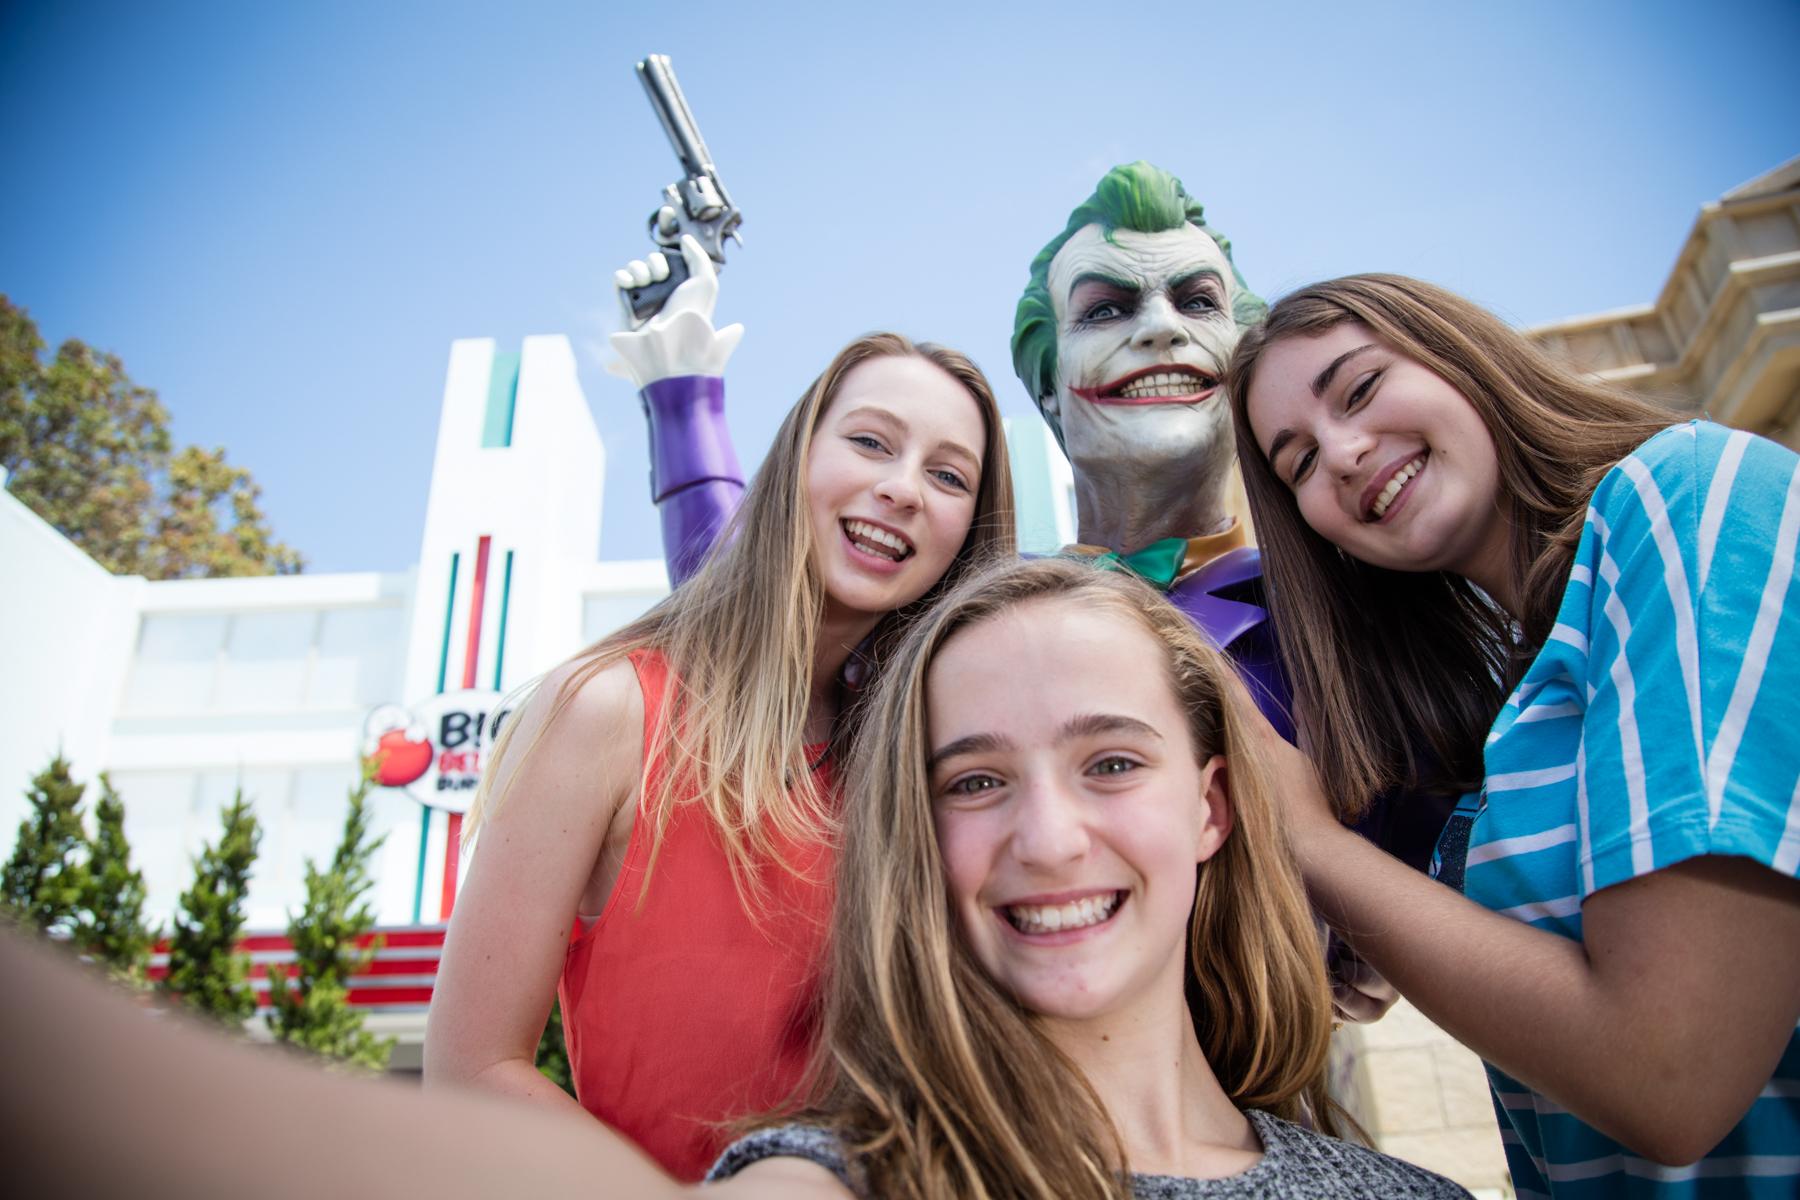 joker and teens